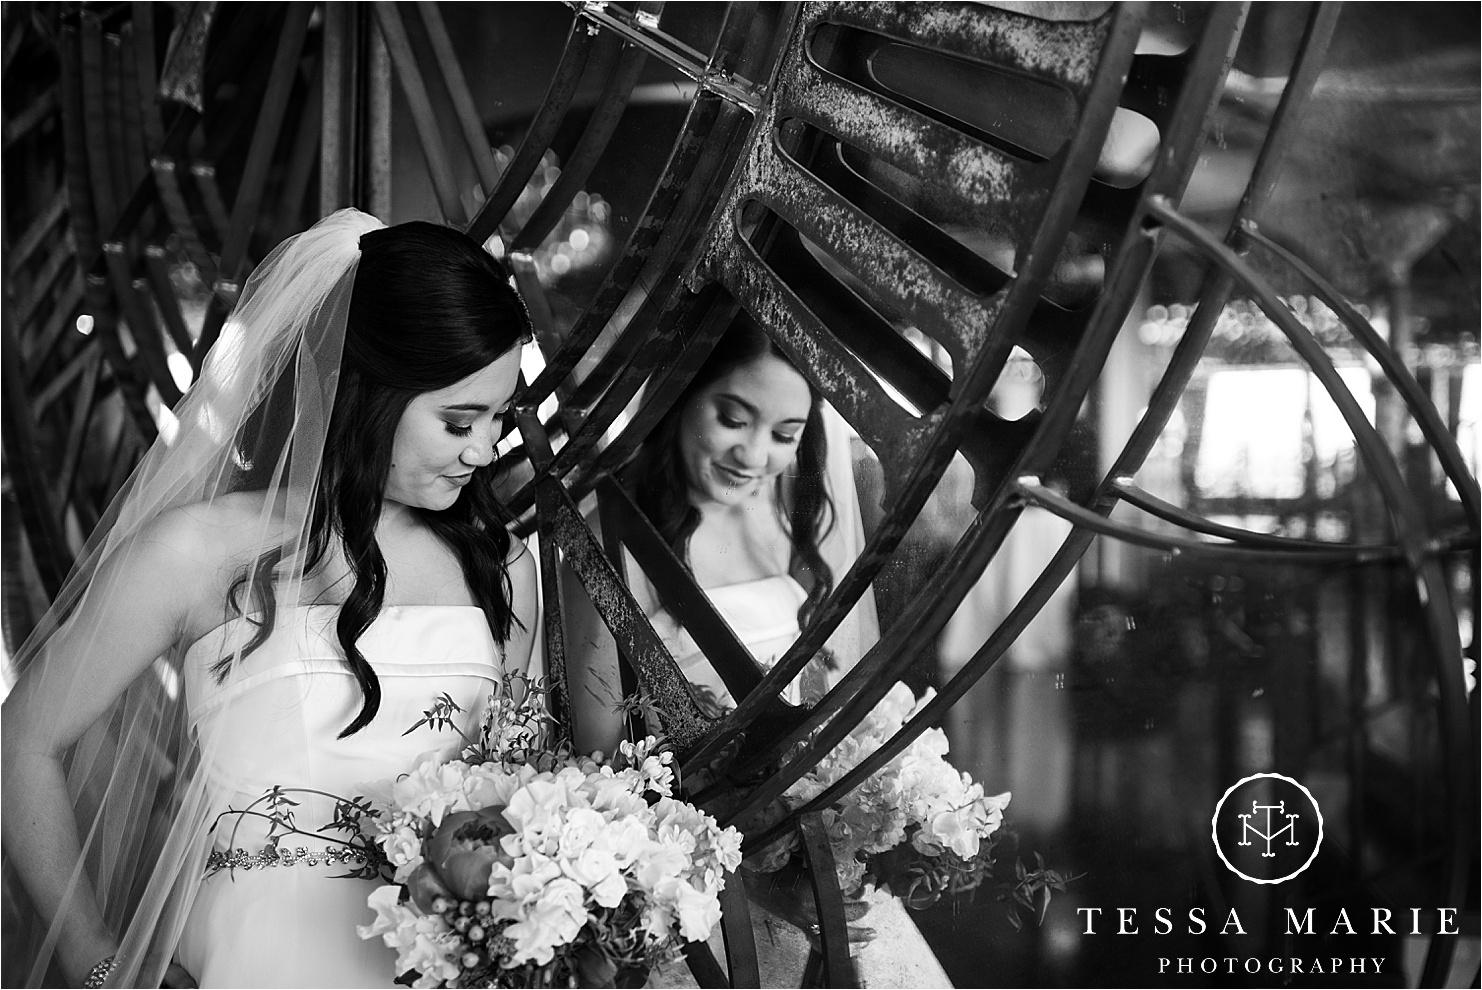 Tessa_marie_weddings_houston_wedding_photographer_The_astorian_0037.jpg